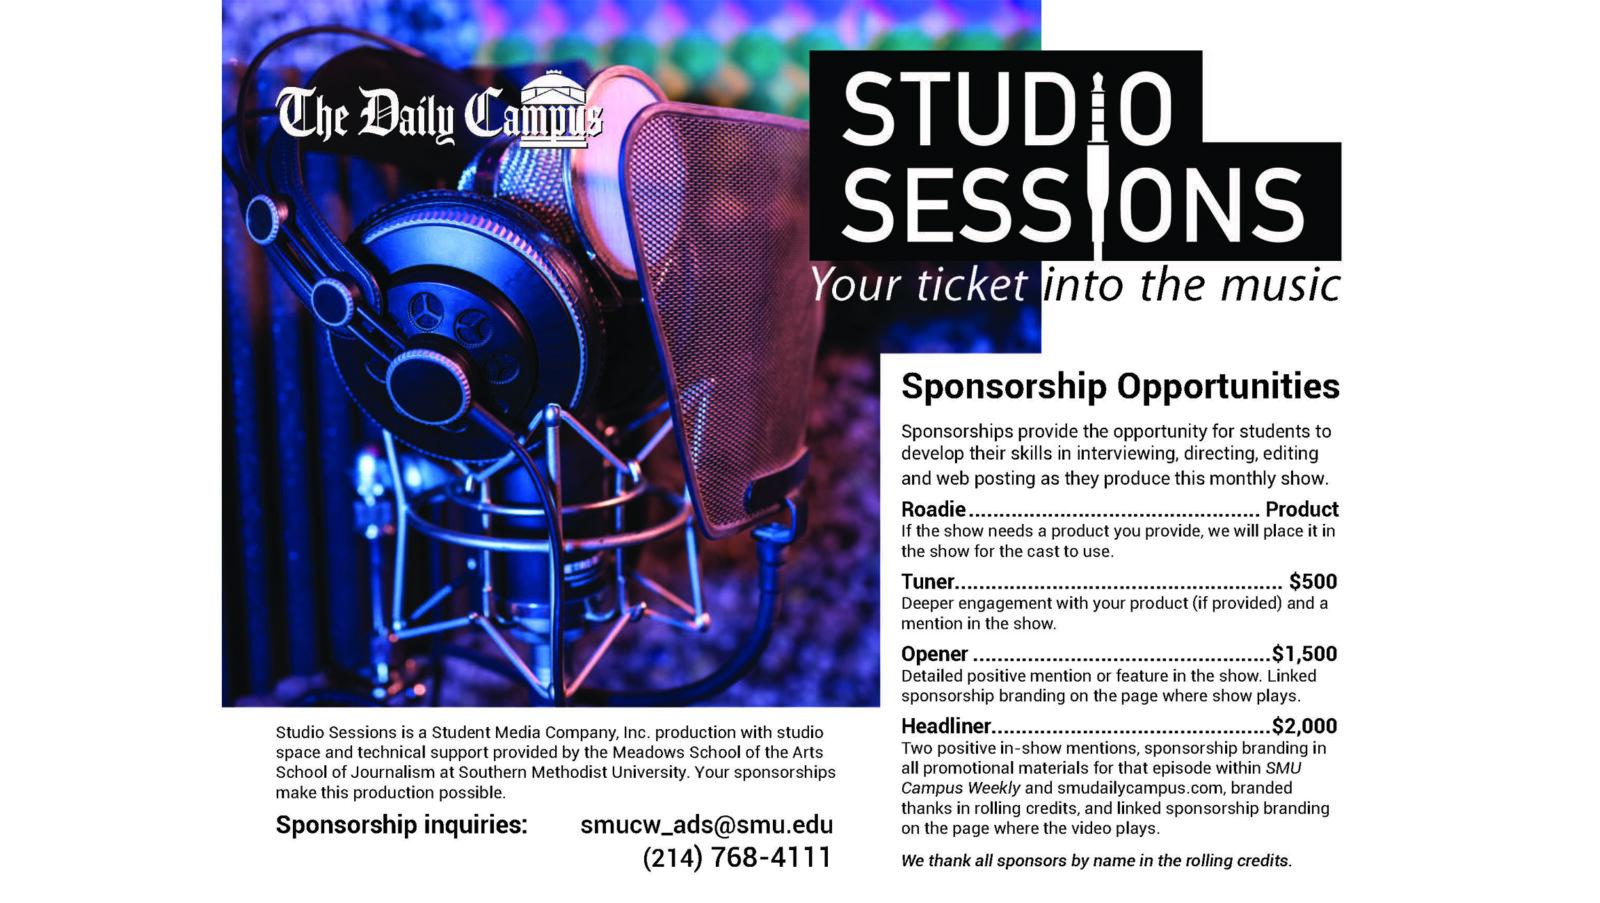 Studio Sessions flier